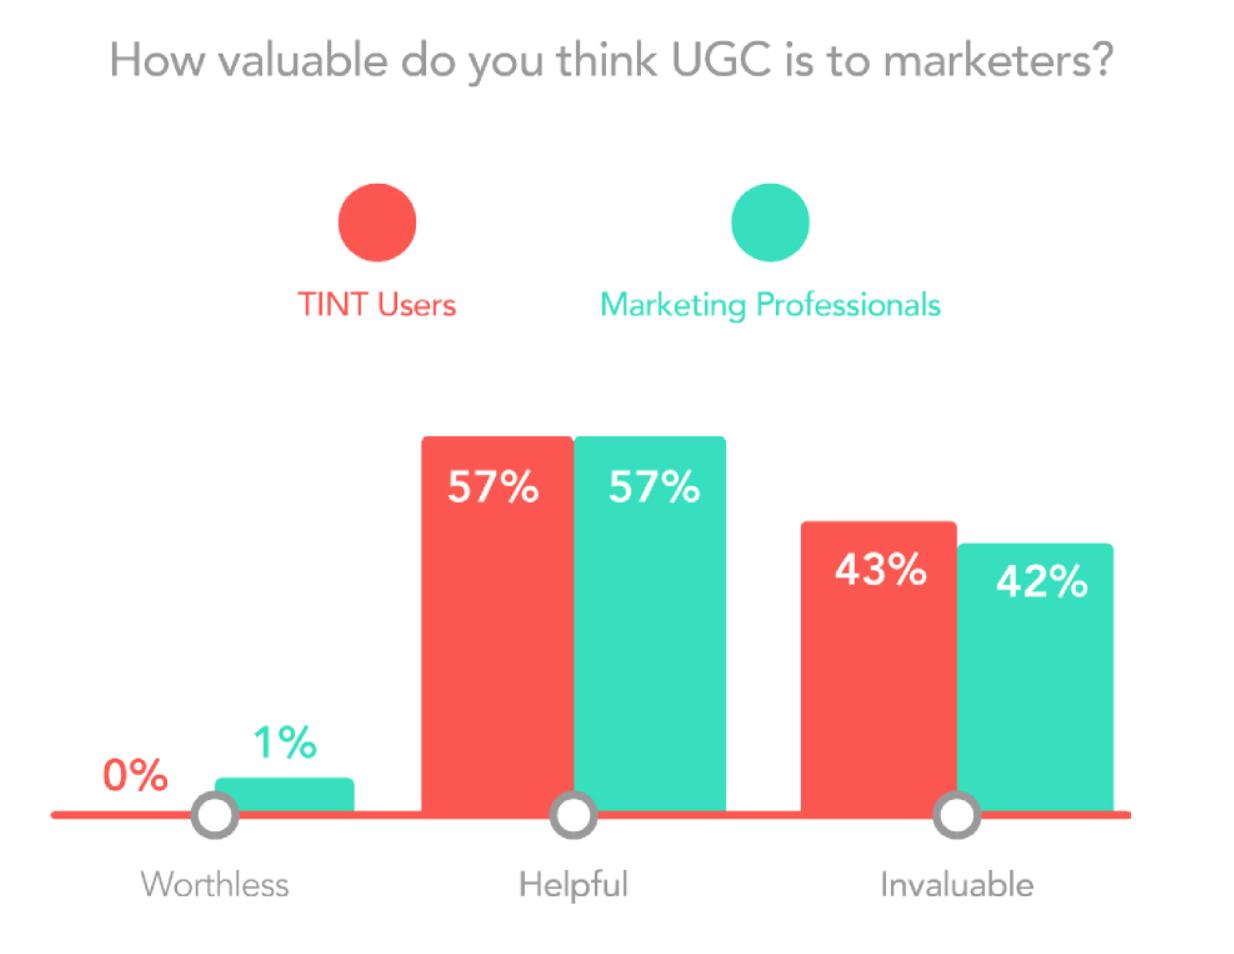 UGC Marketing - how valuable is it?